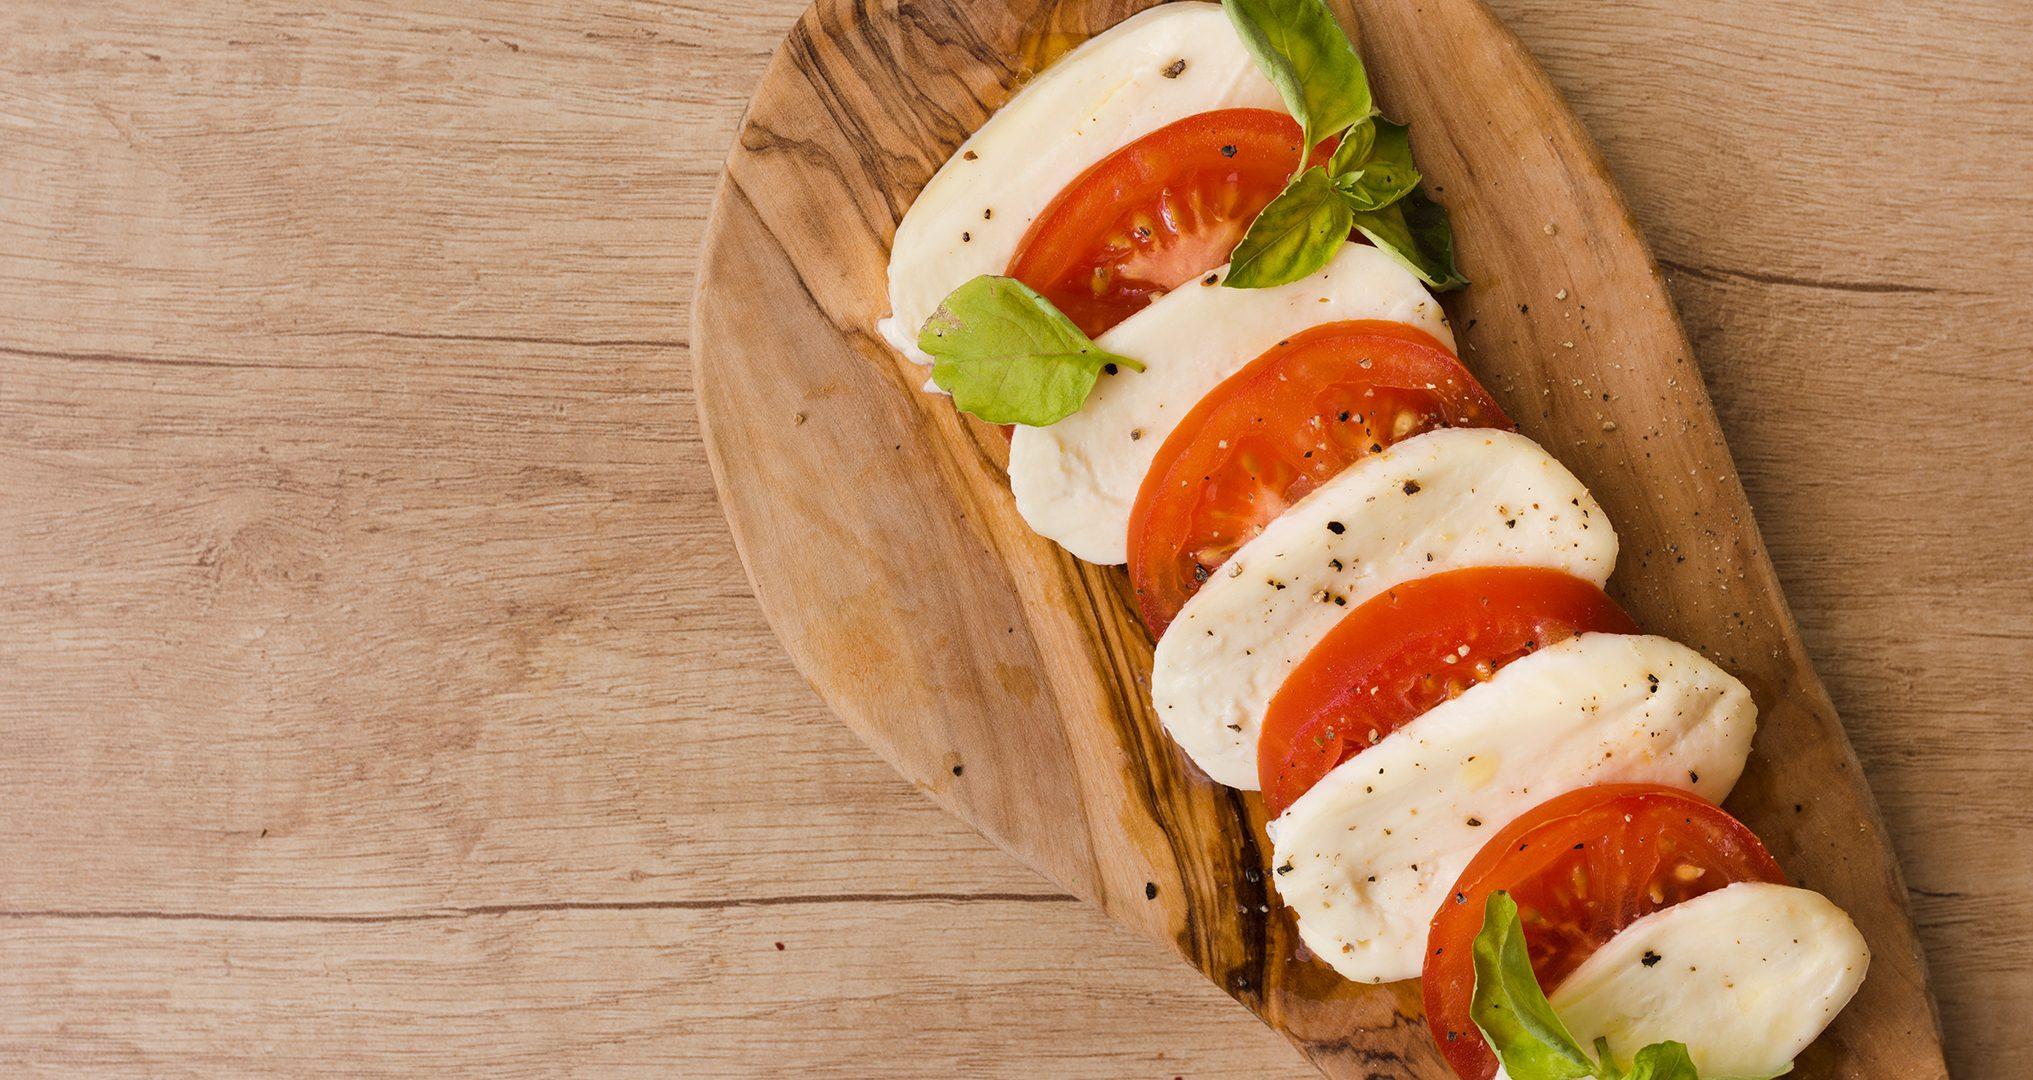 Roz's Caprese Salad with Grape Tomatoes, Mozzarella & Basil